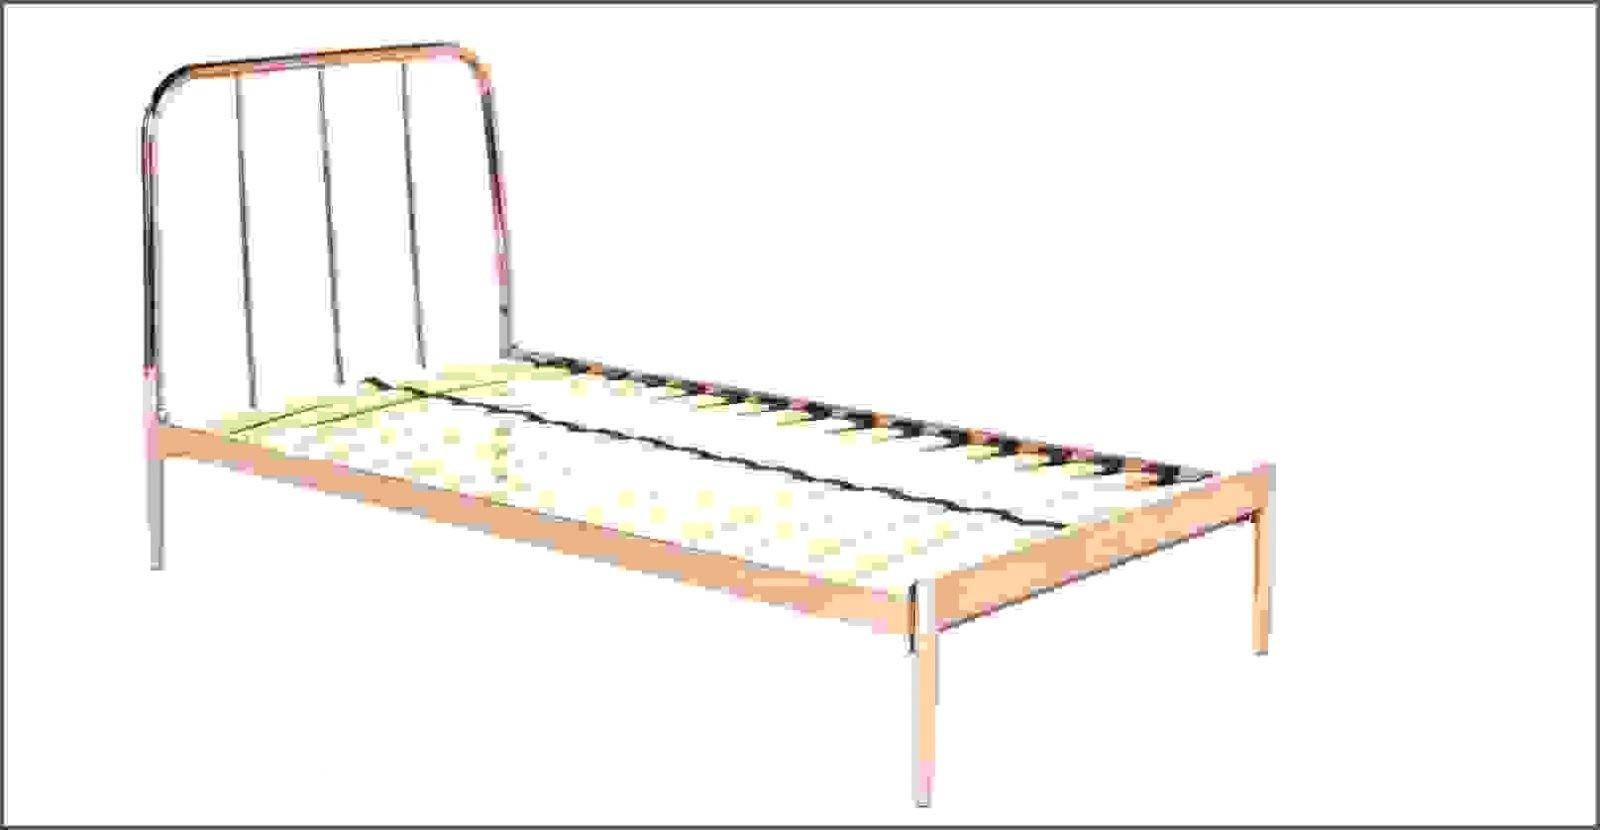 hochbett wei ikea awesome ikea hochbett with hochbett wei. Black Bedroom Furniture Sets. Home Design Ideas